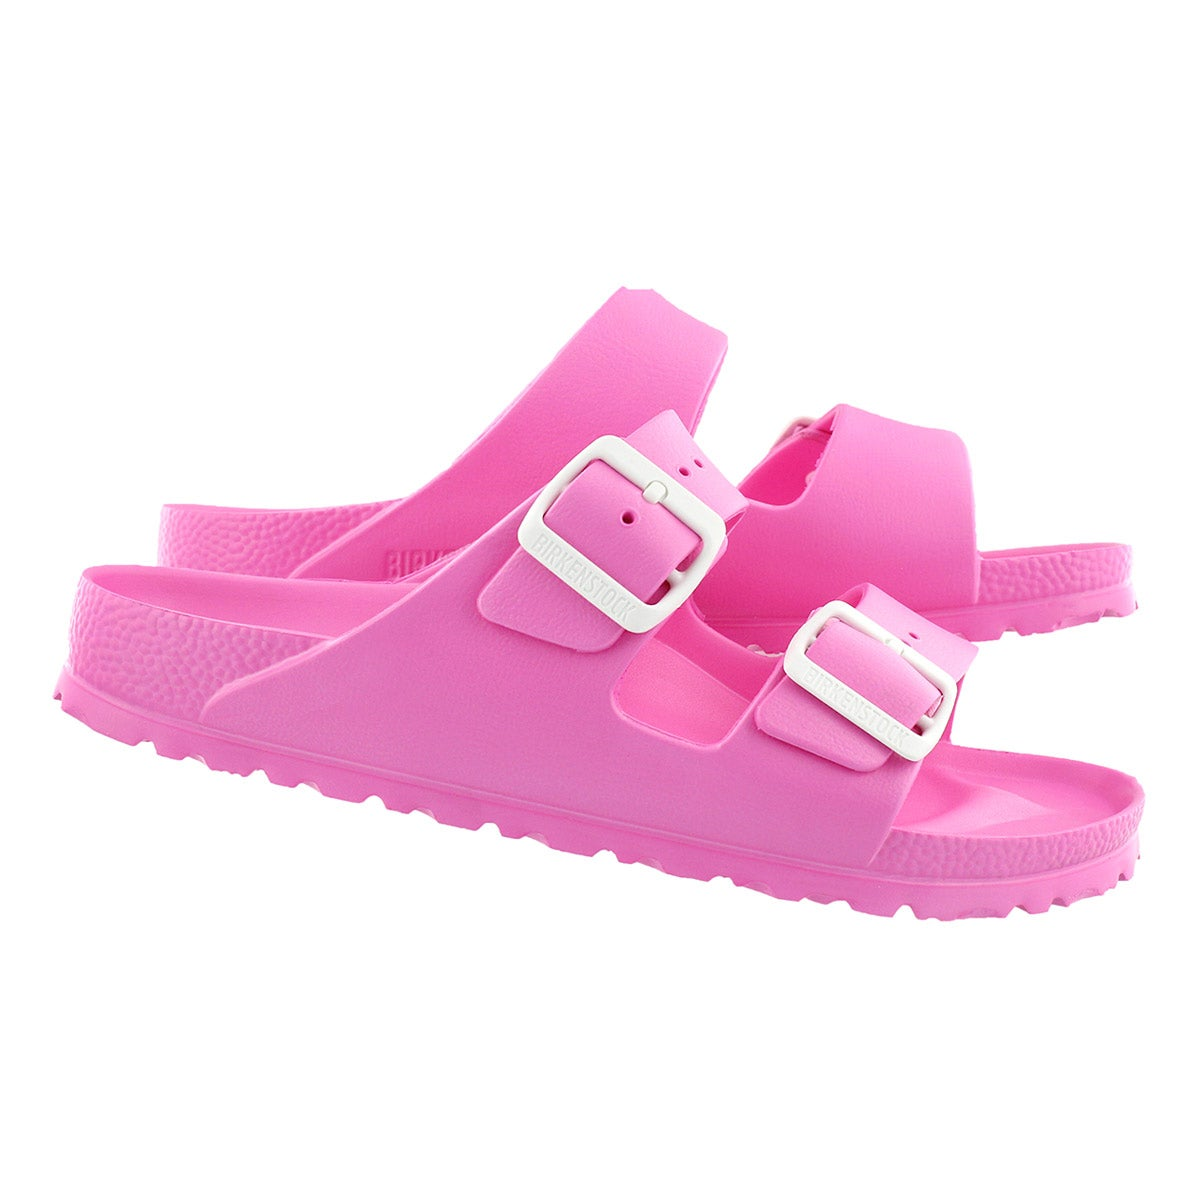 Lds Arizona EVA neon pink sandal-Narrow